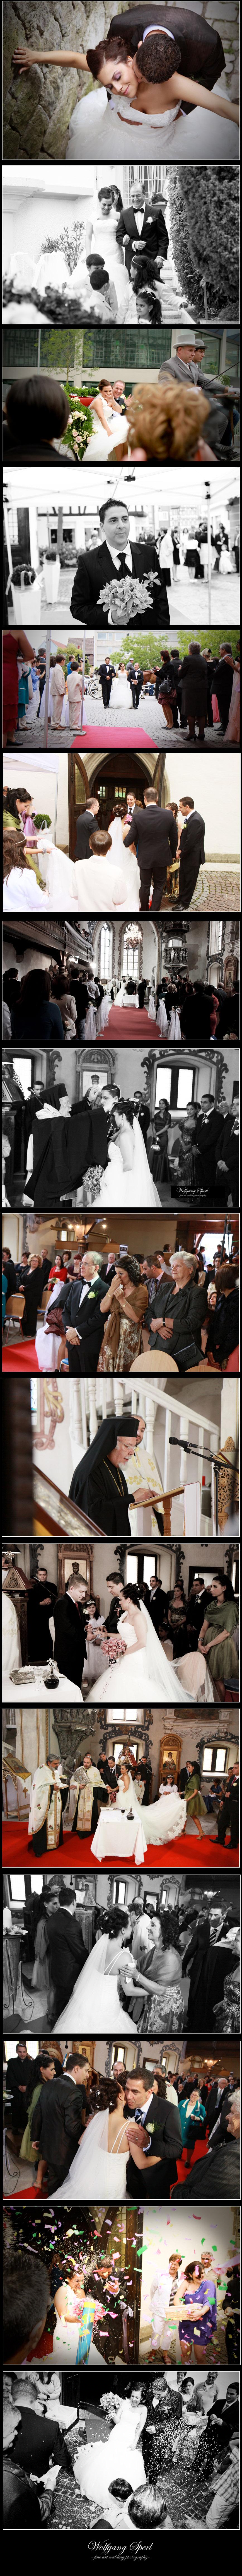 Hochzeitsfotograf Waiblingen Bürgerzentrum